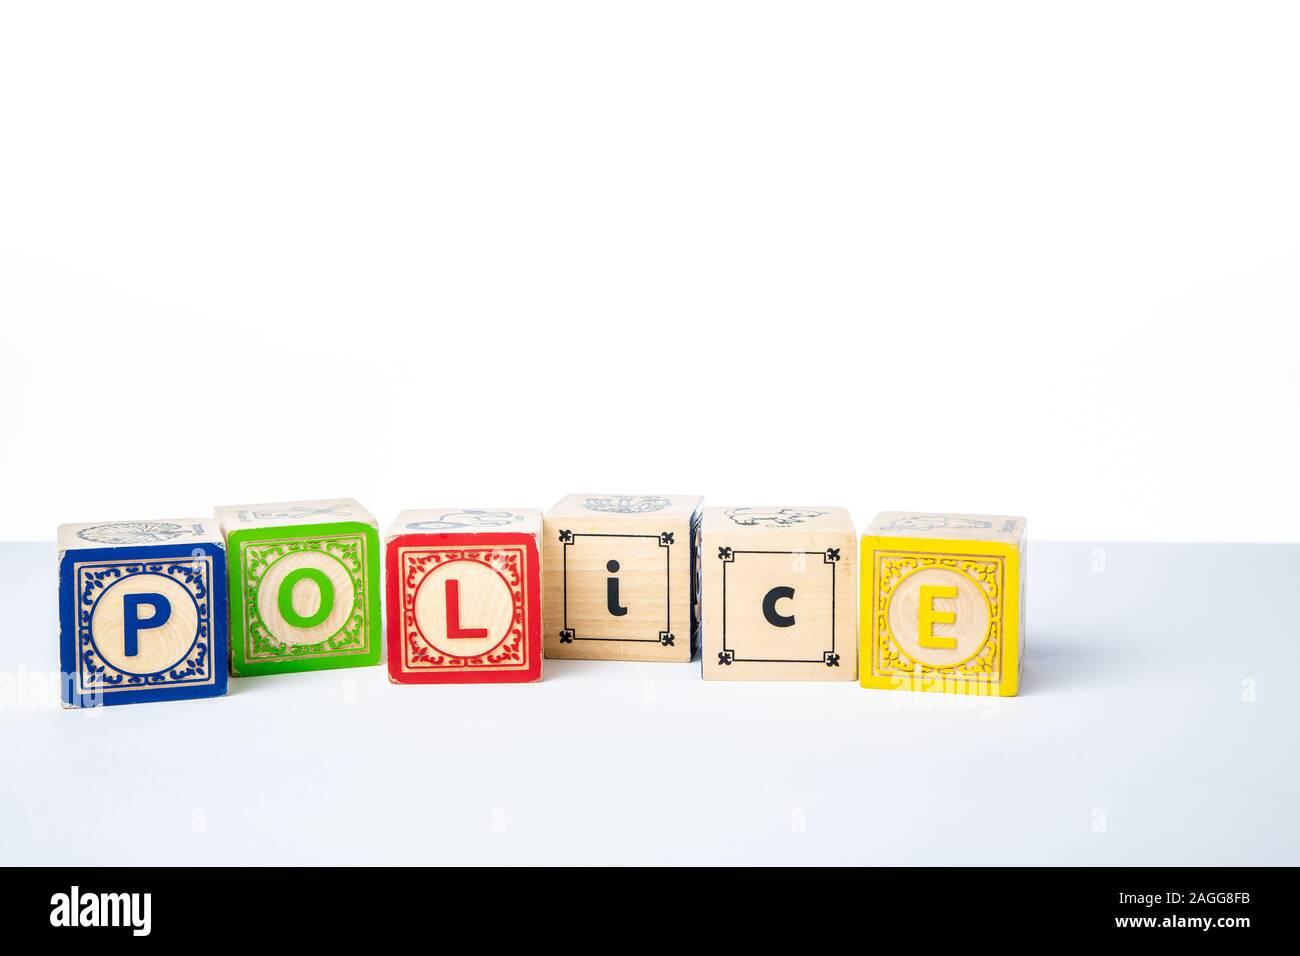 Childrens Wooden Alphabet Blocks Spelling the Word Police Stock Photo